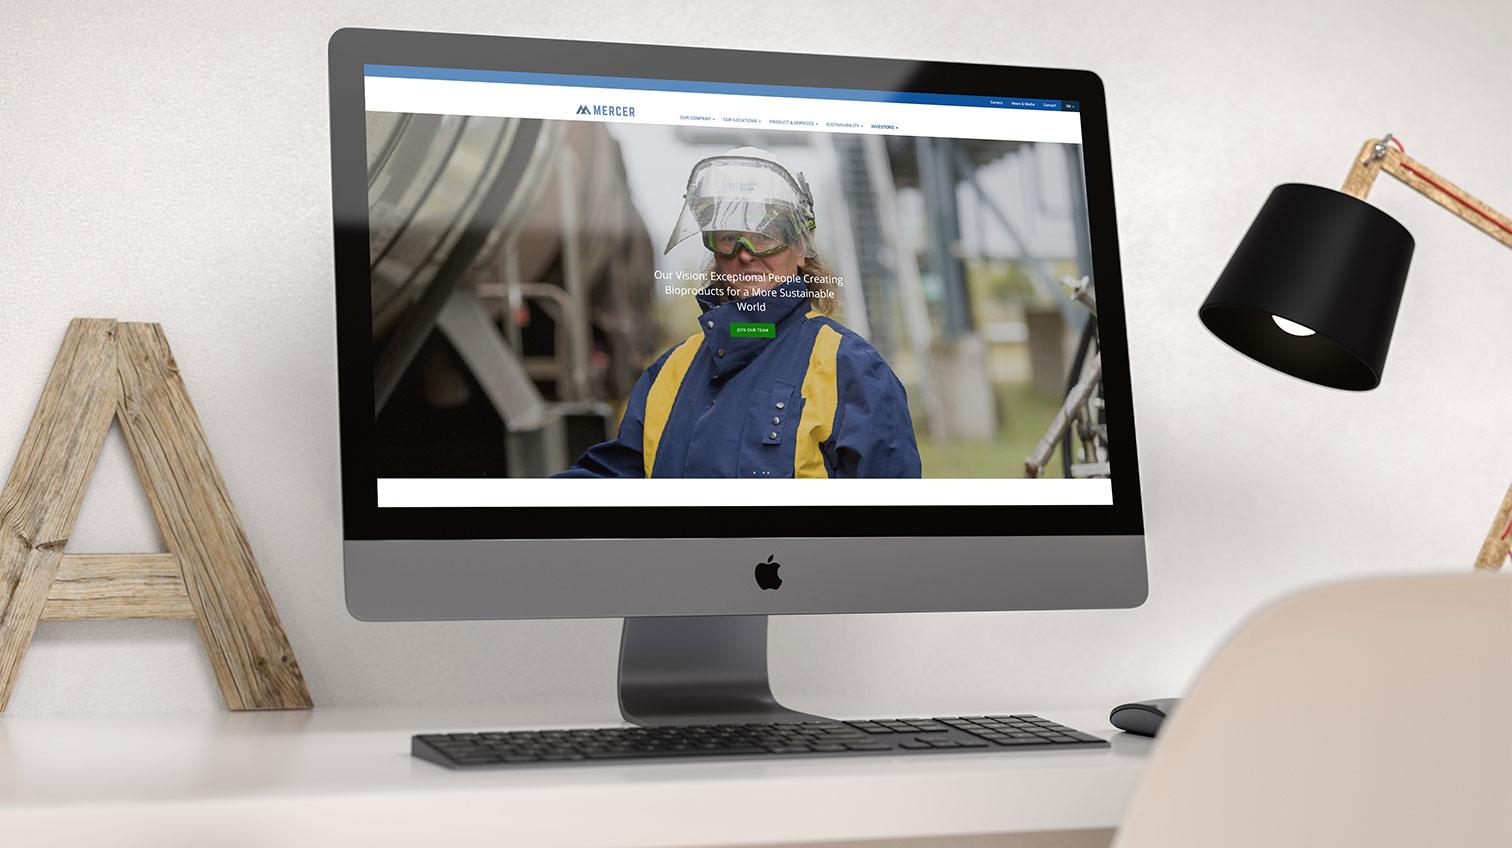 Mercer website shown on a desktop computer - White canvas design